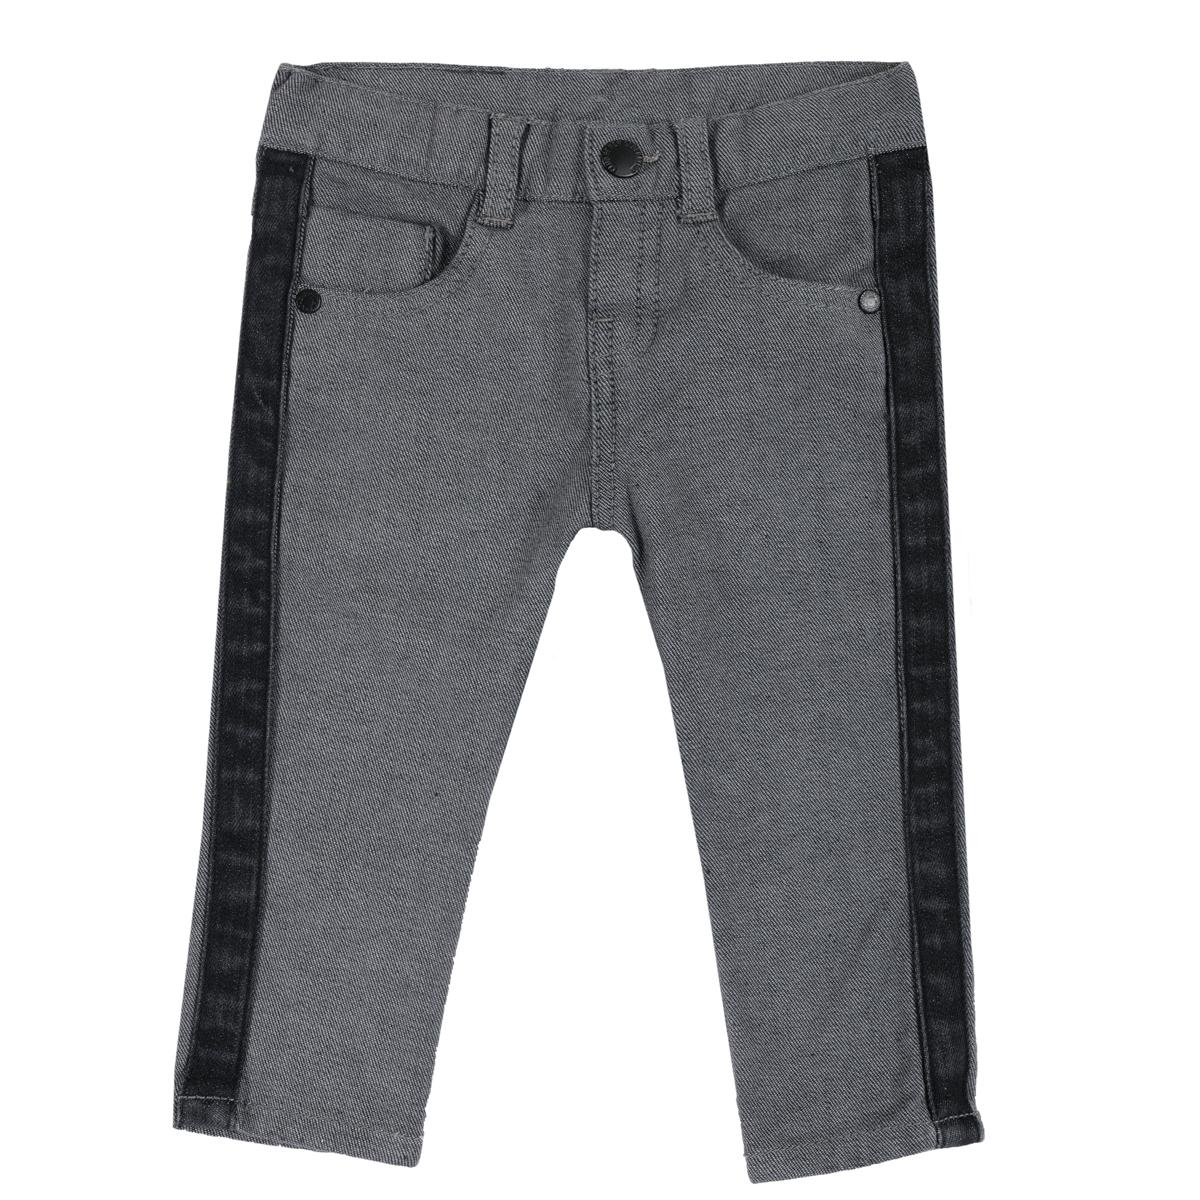 Pantalon lung copii Chicco, gri, 08016 din categoria Pantaloni copii